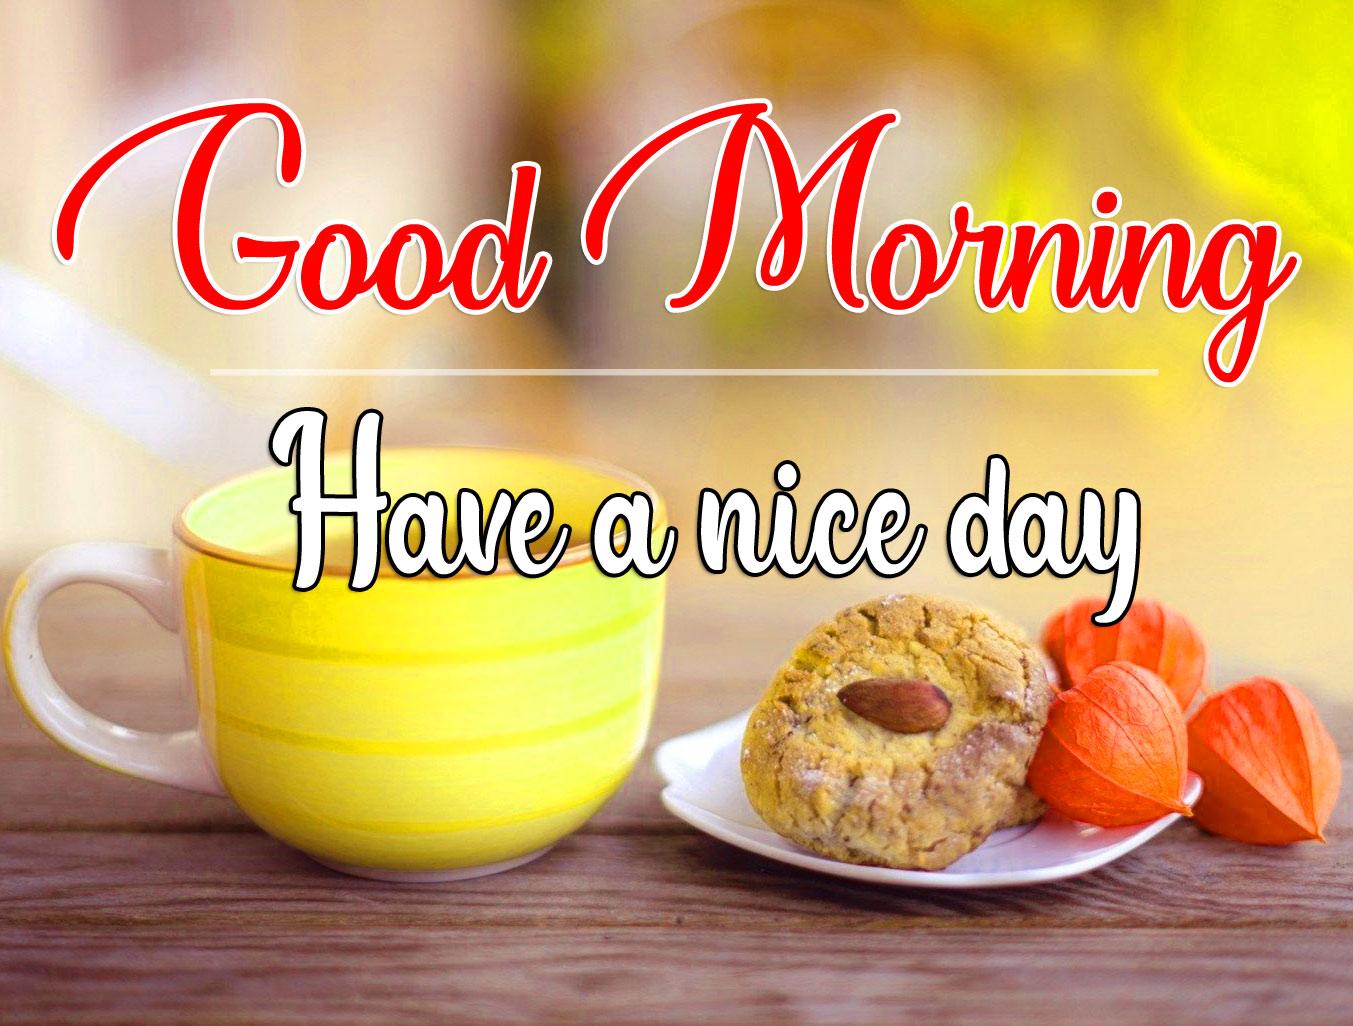 88+ Good Morning Images Wallpaper Download